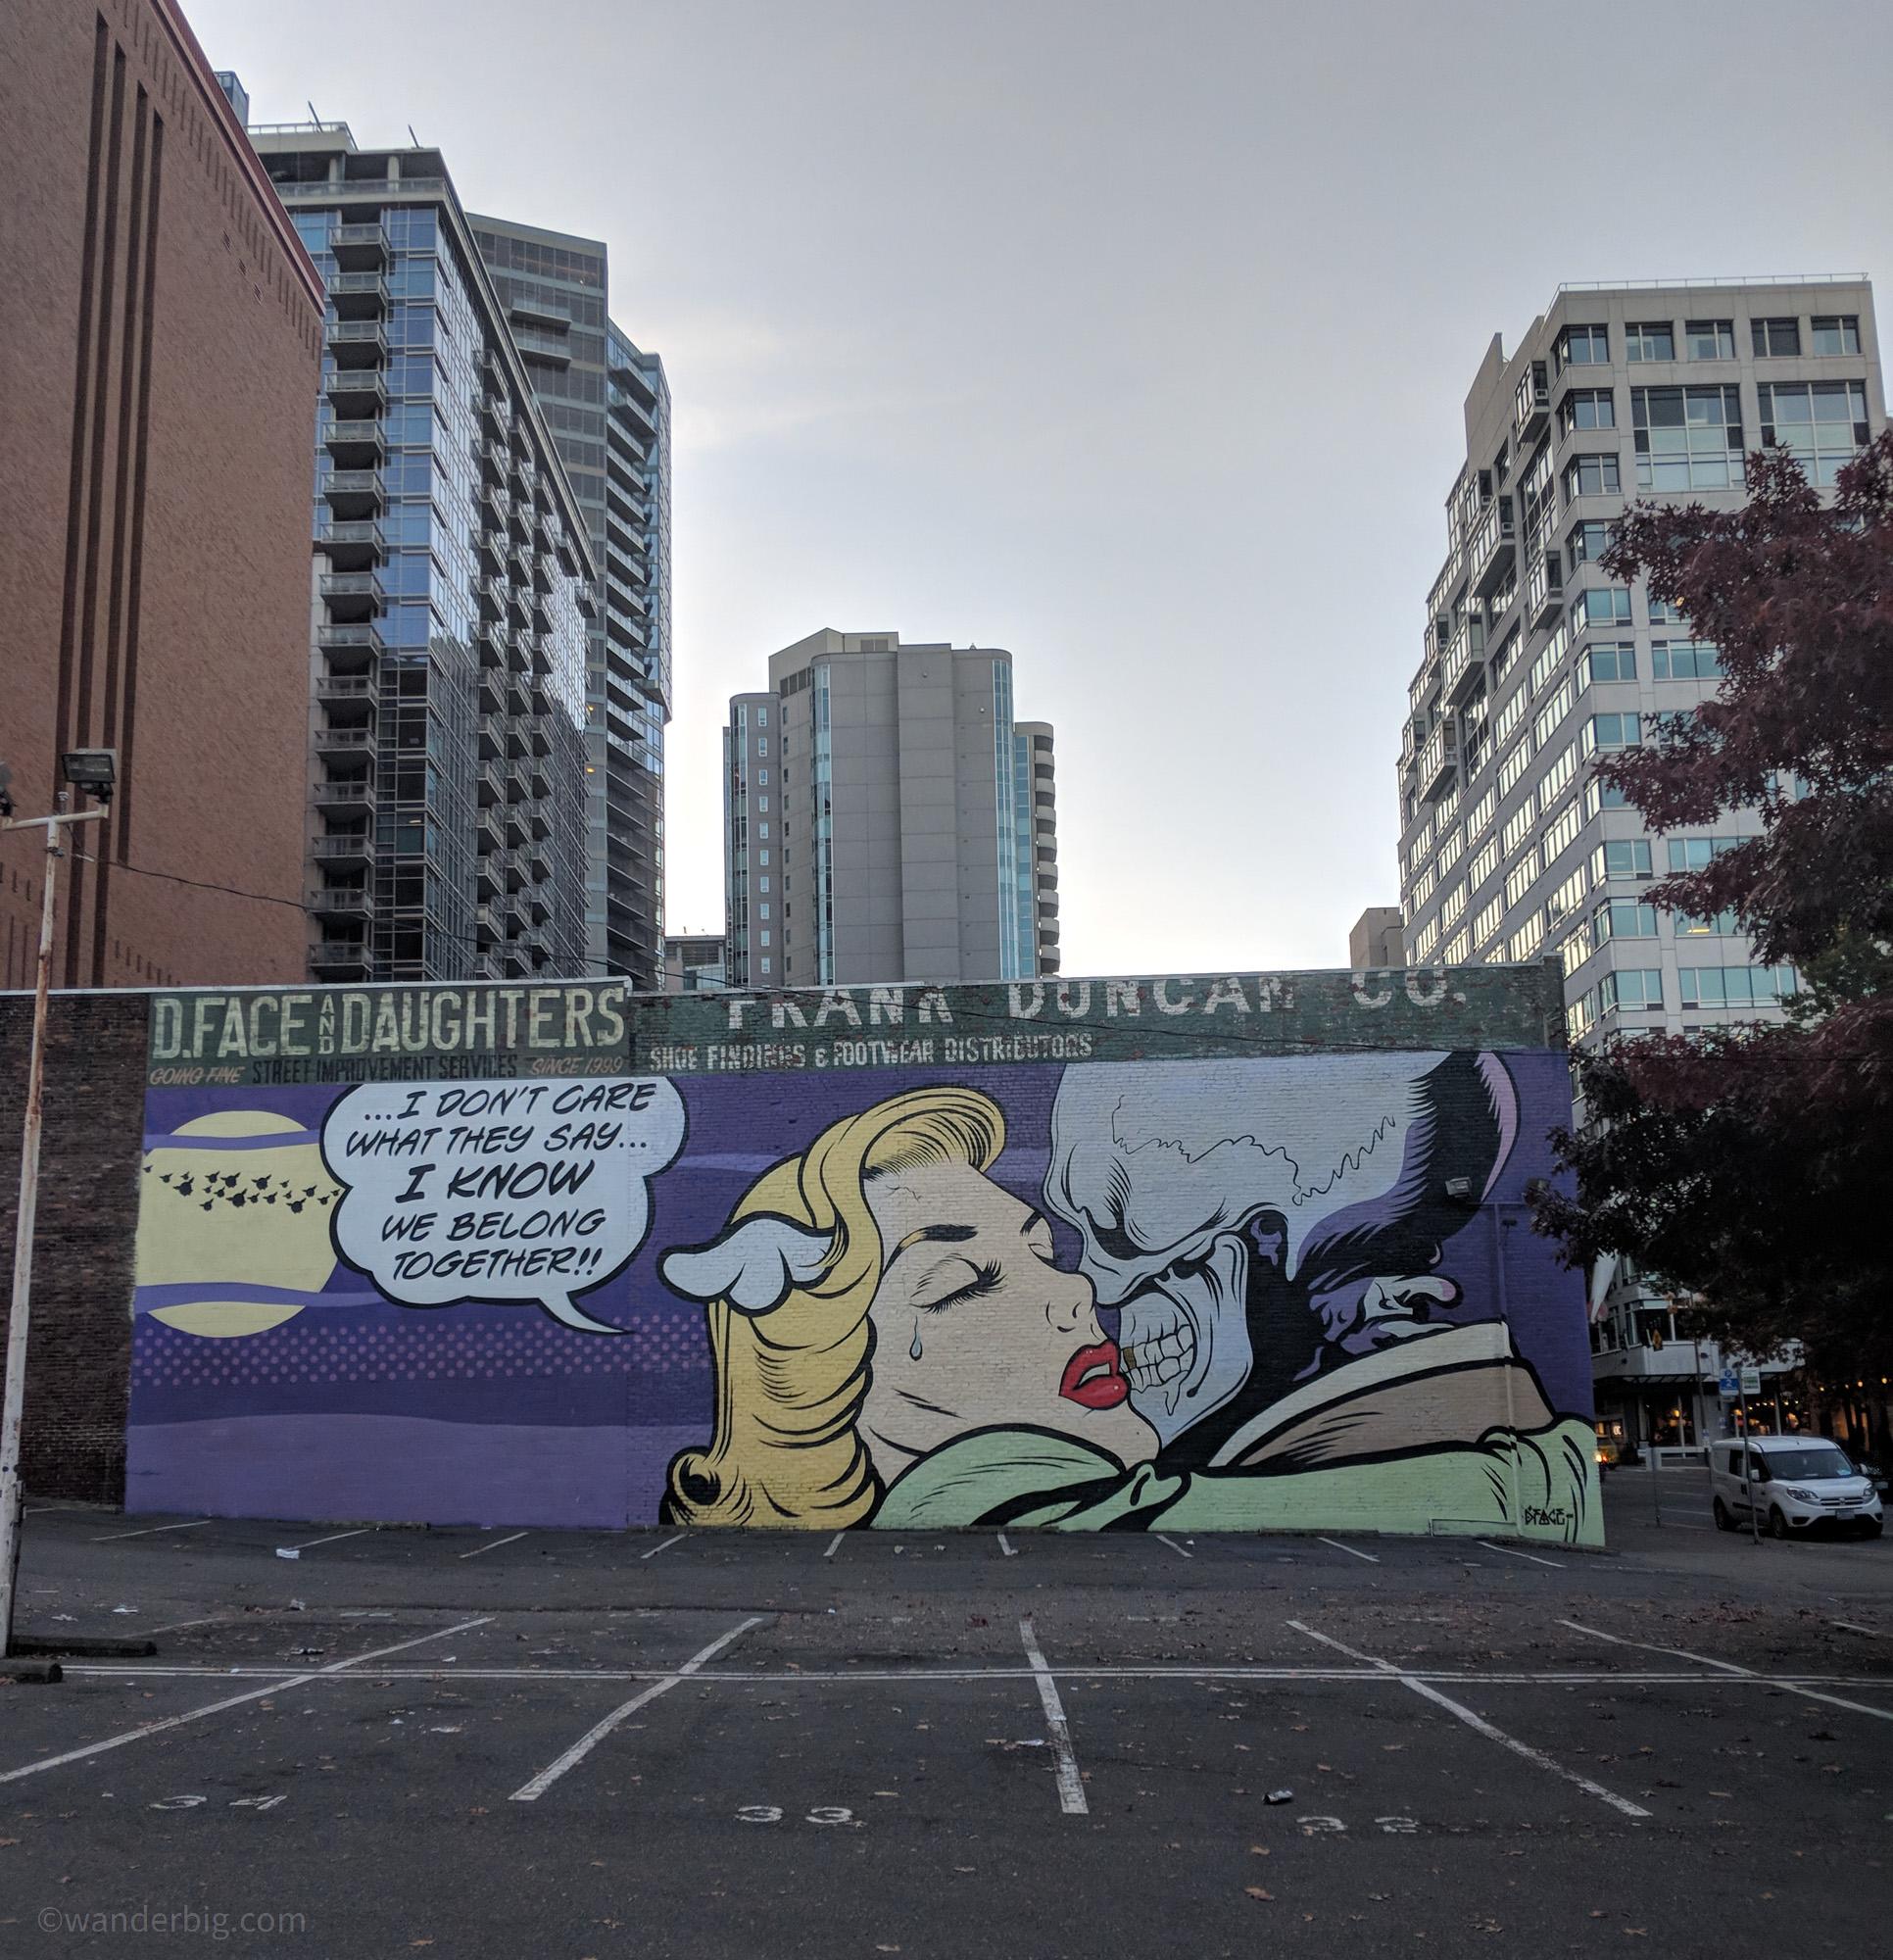 A comic inspired mural